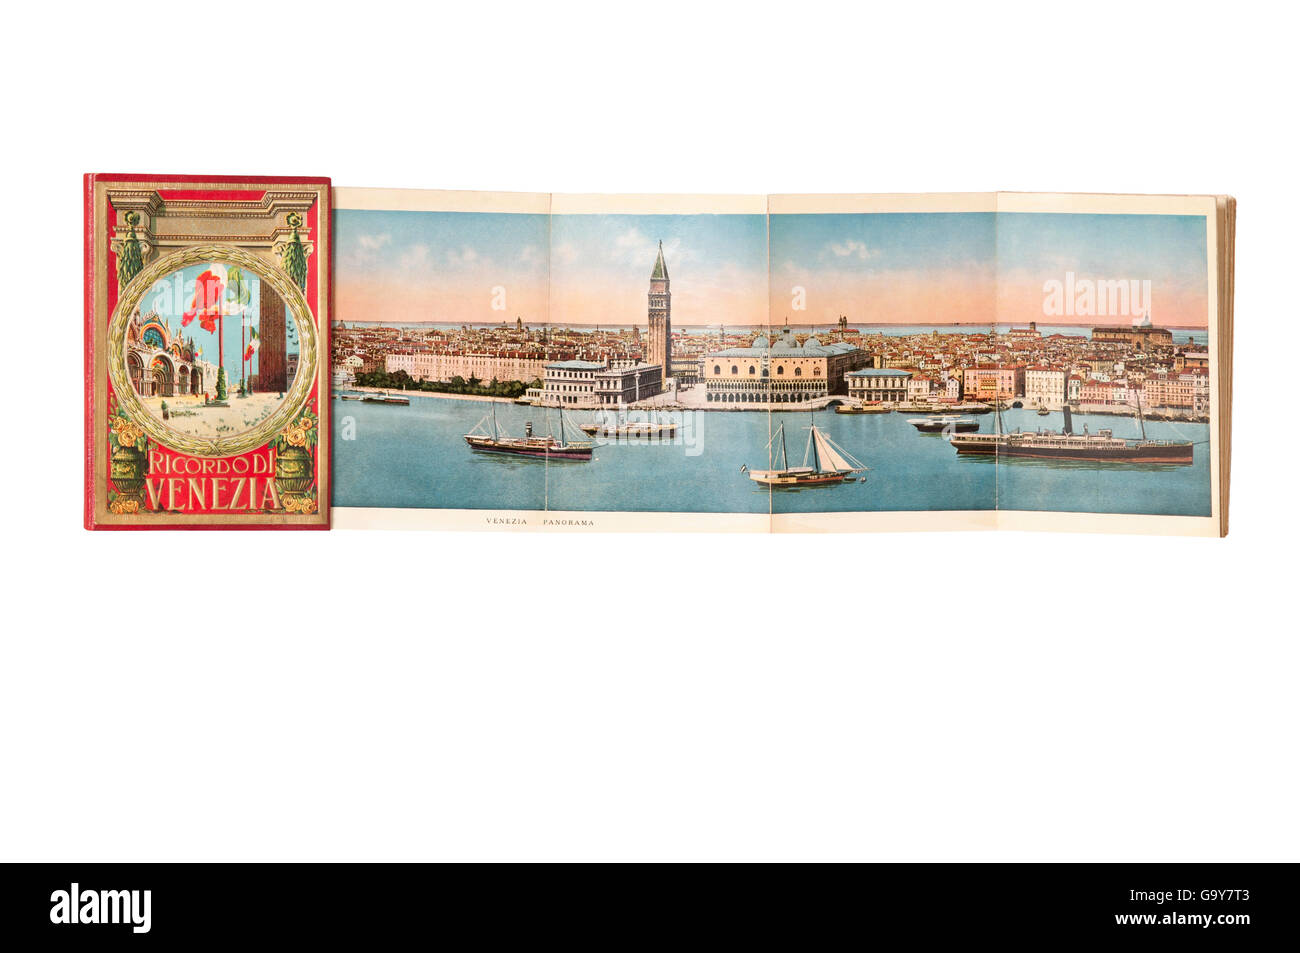 Postcard folder of Venice early twentieth century - Stock Image